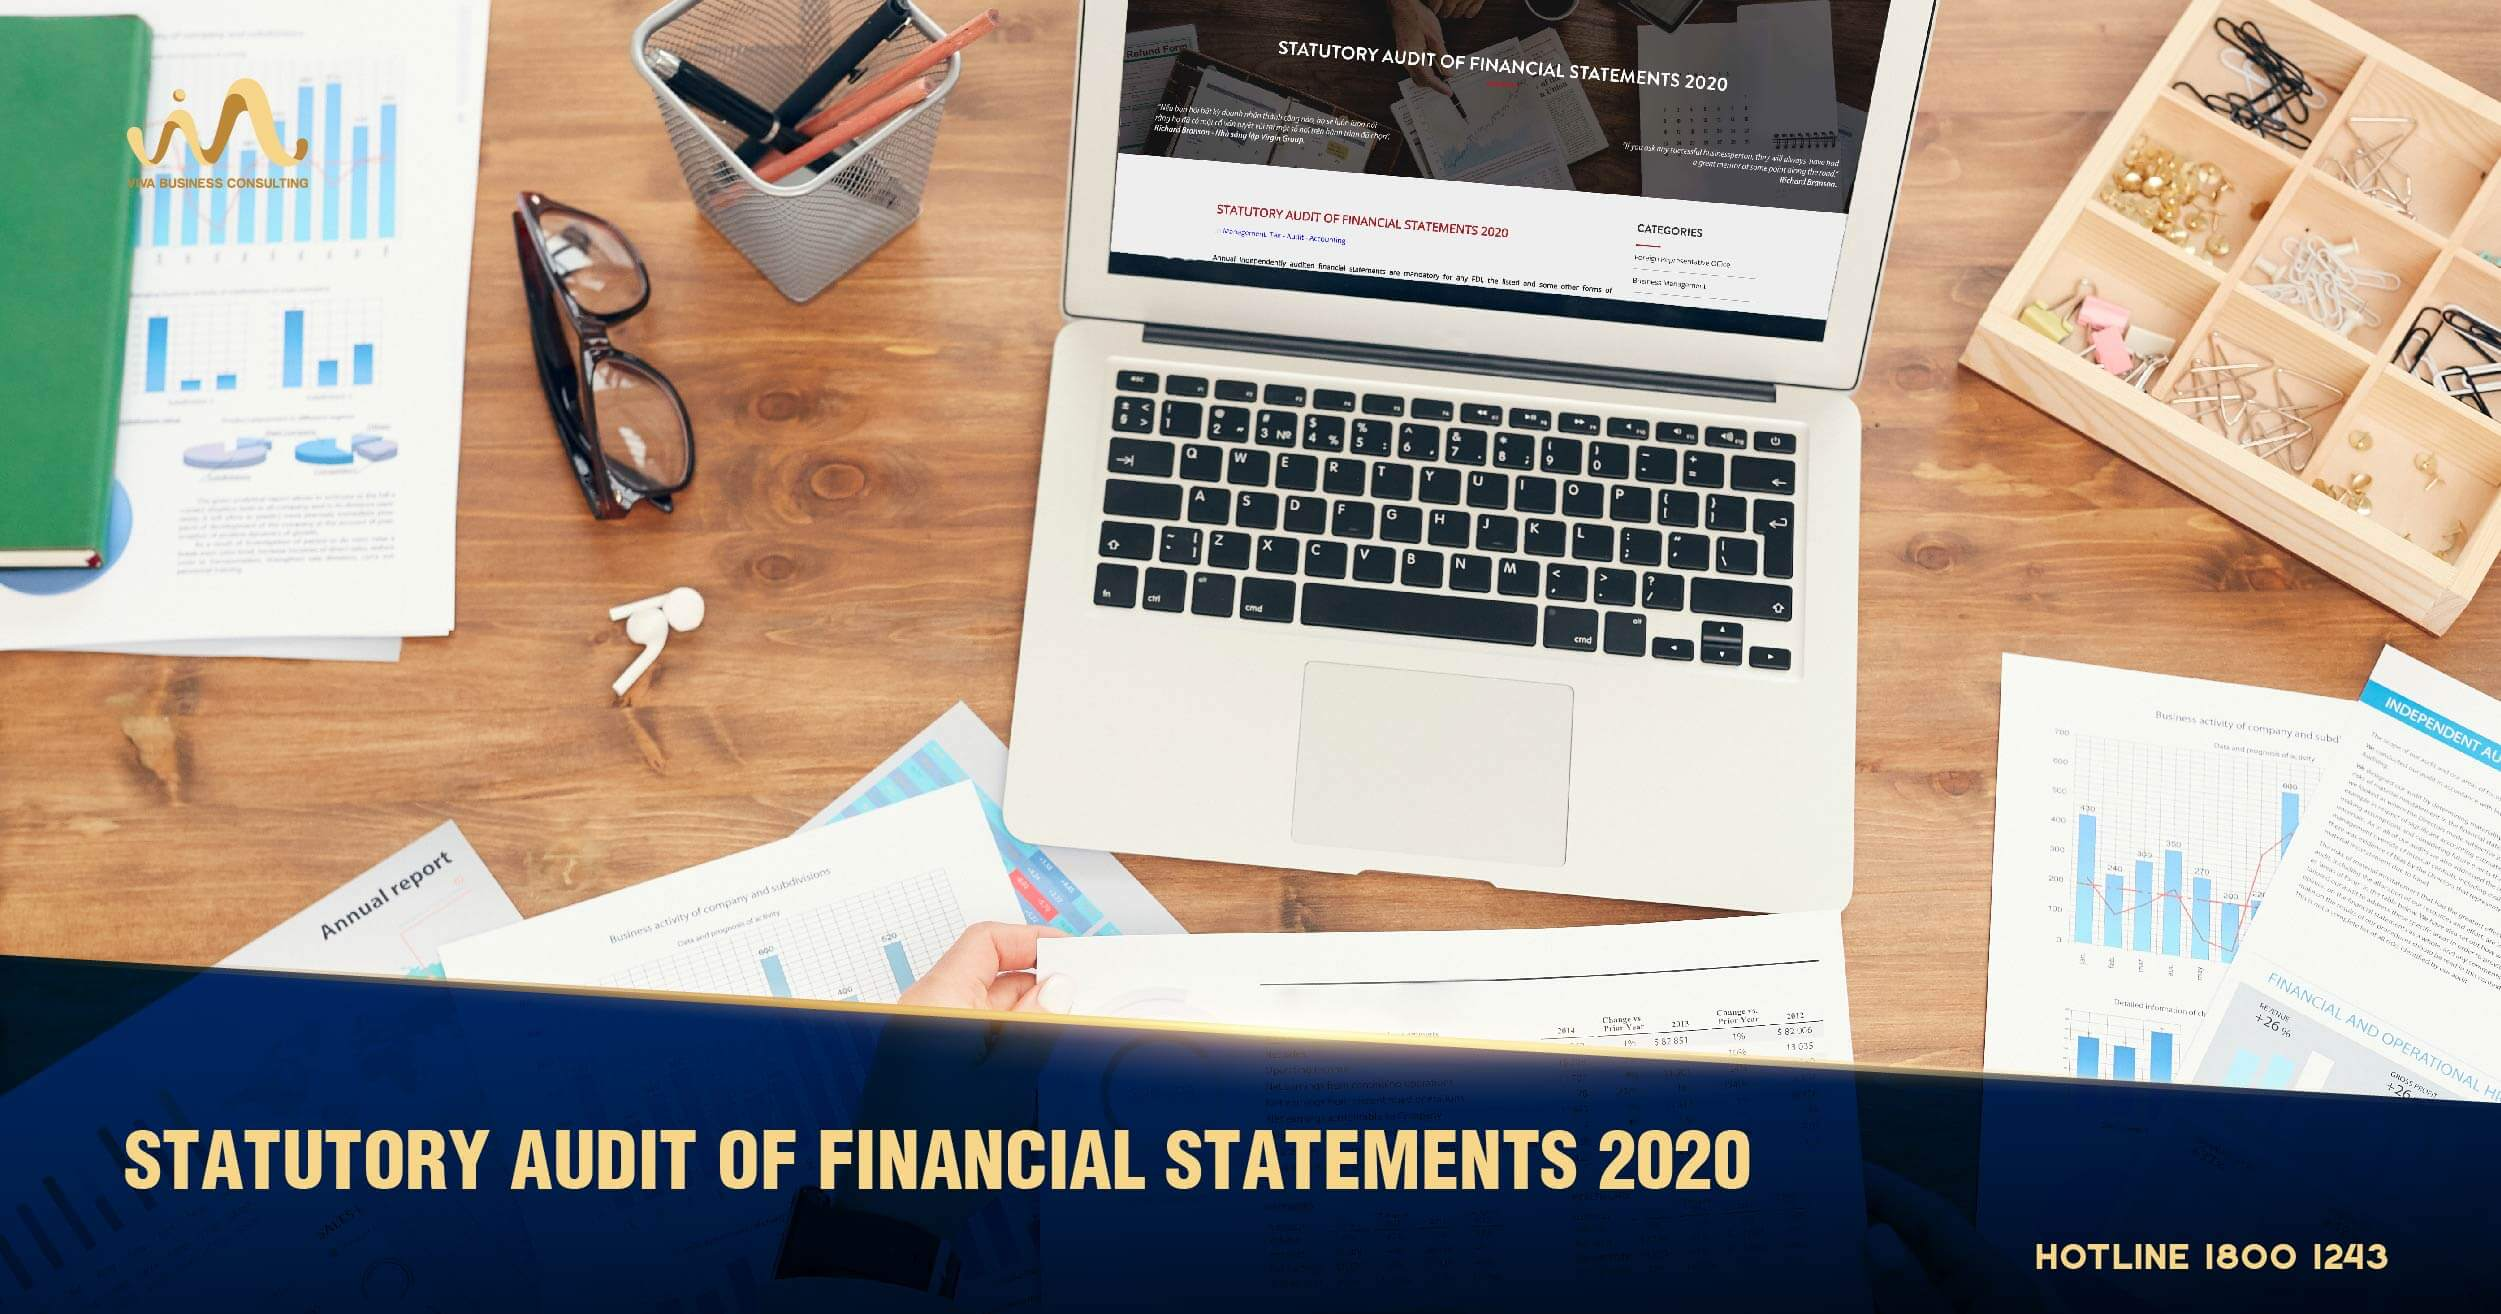 Statutory Audit Of Financial Statements 2020